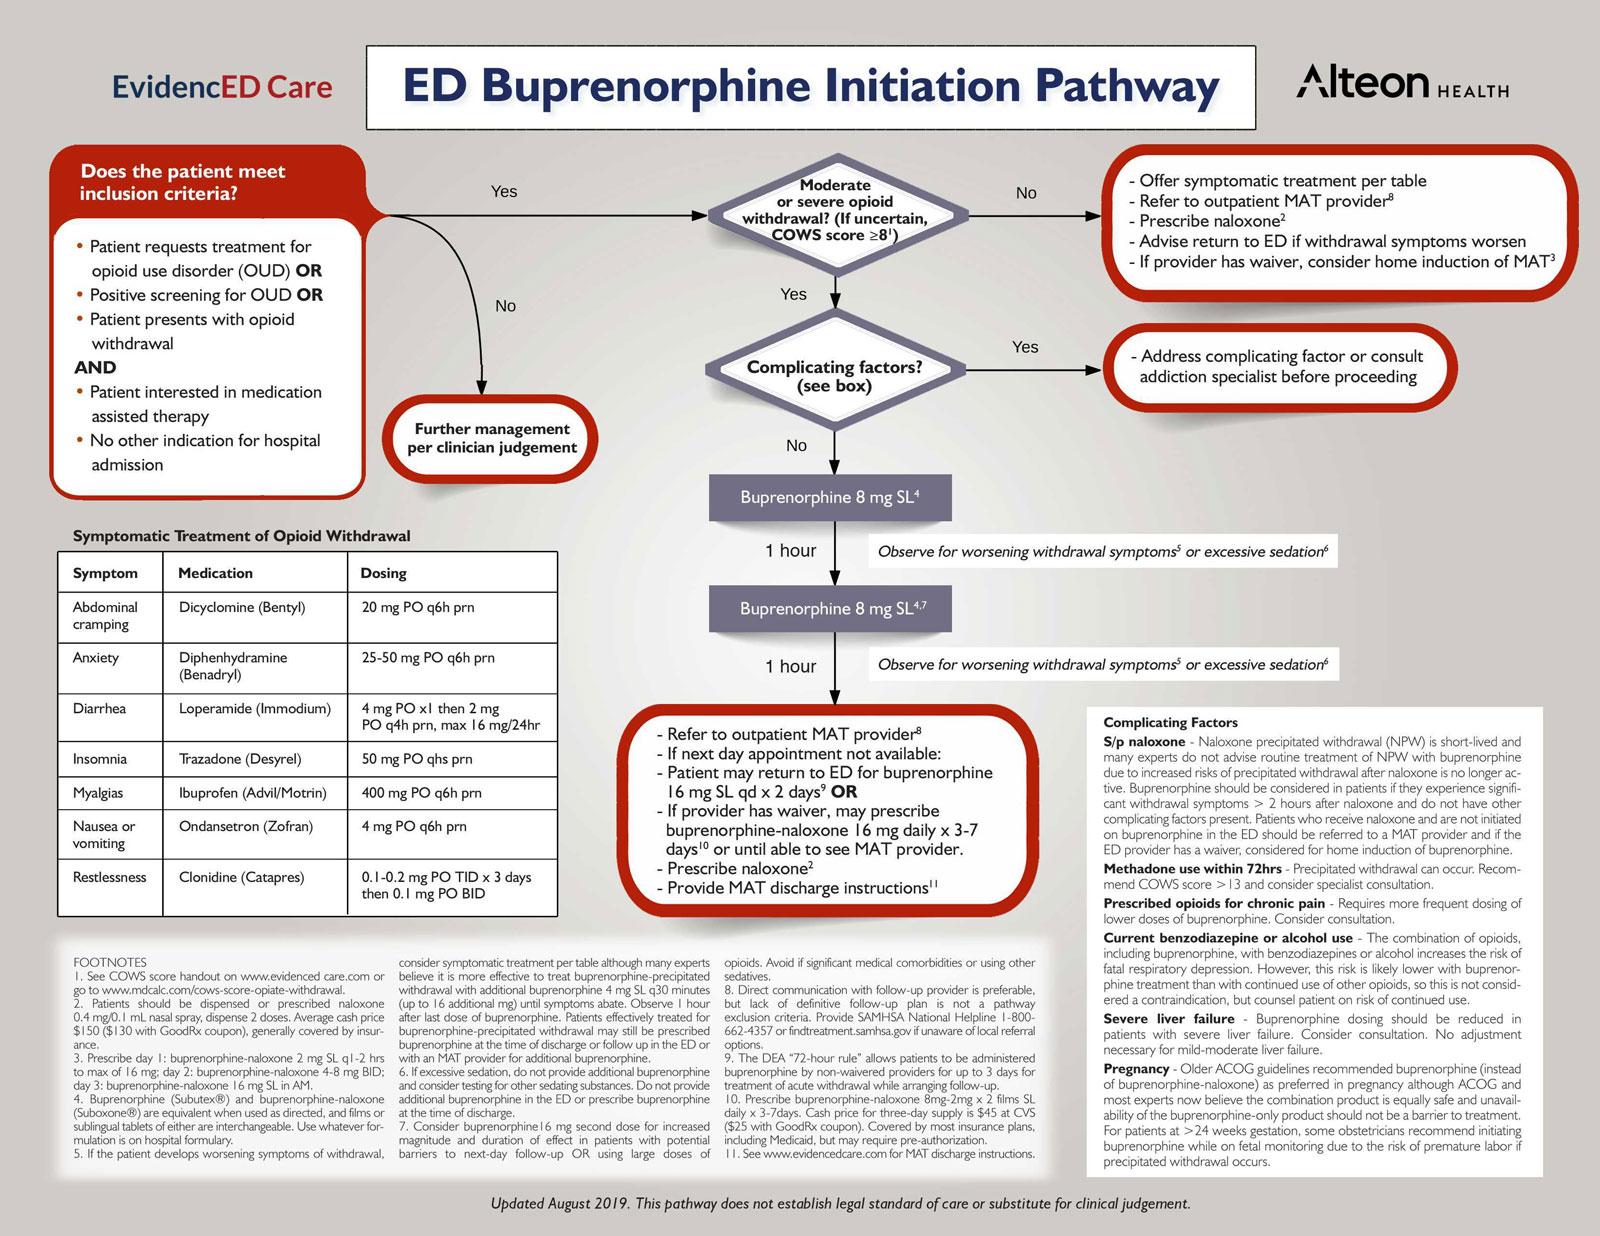 Buprenorphine-ED-Initiation-Pathway-Final-August-2019.jpg